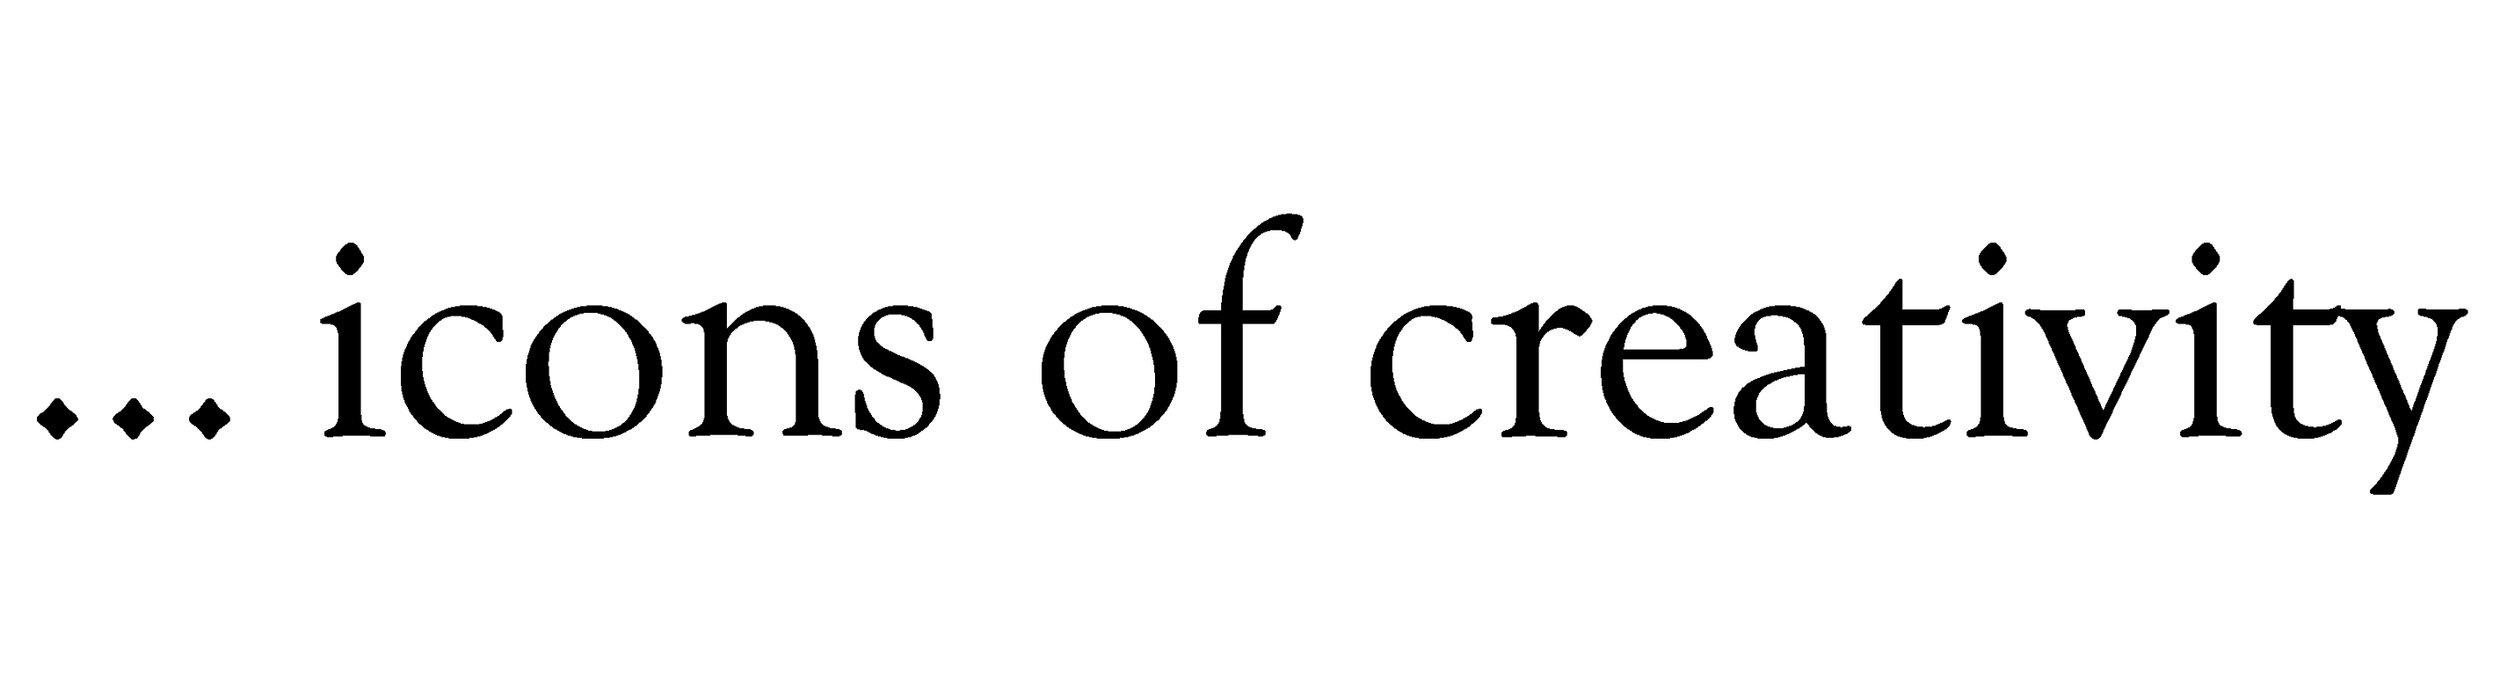 icons of creativity.jpg